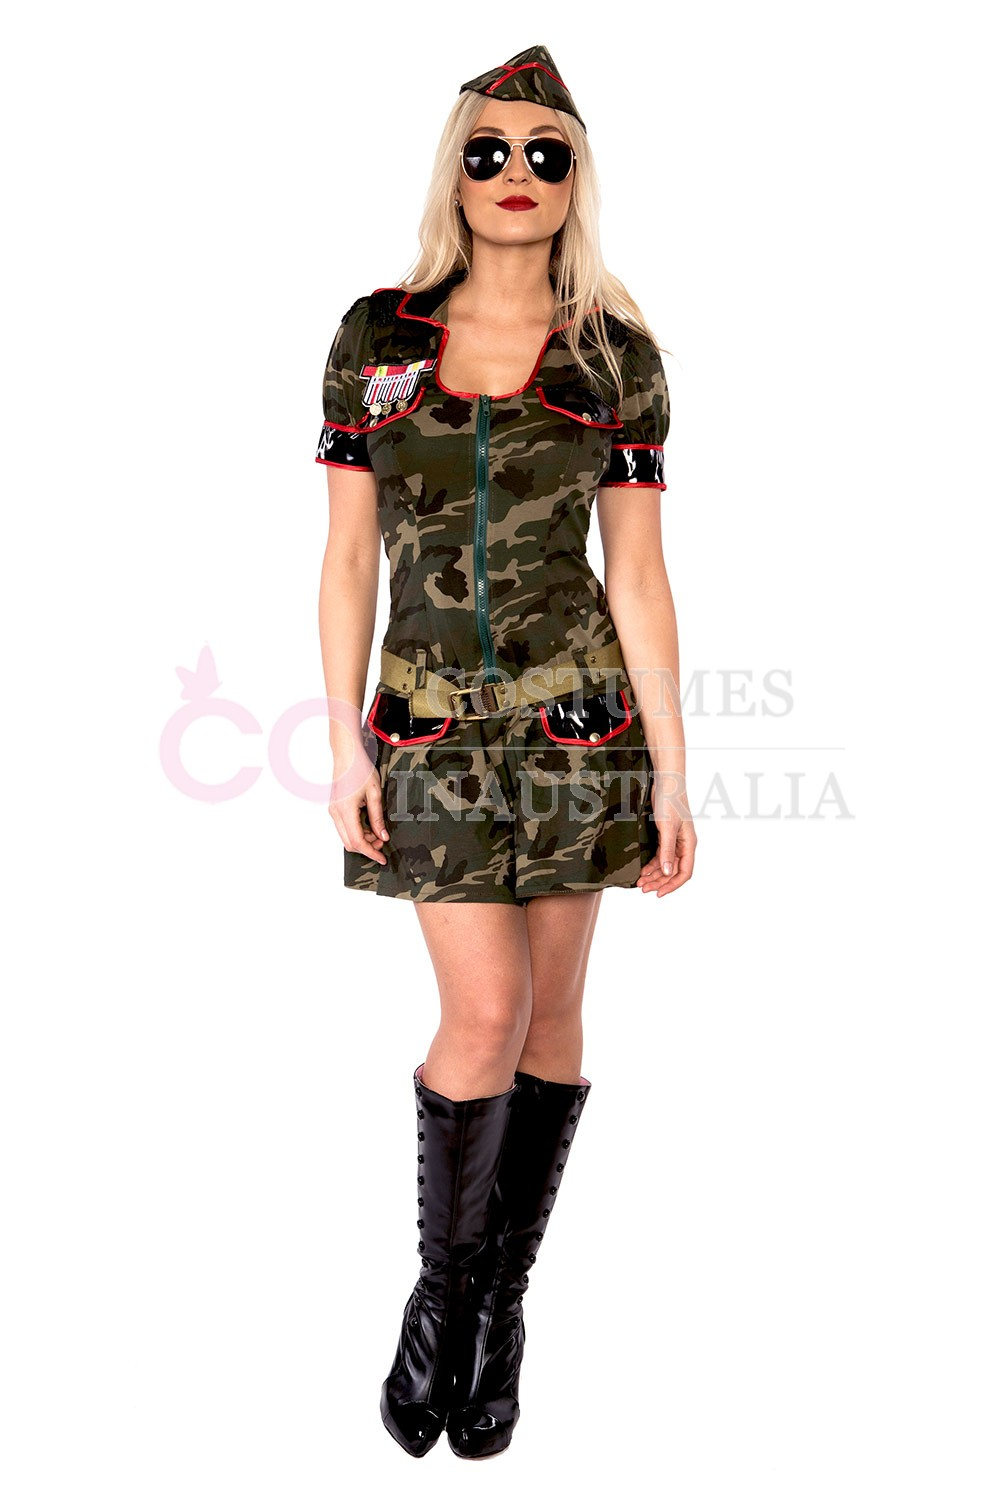 Army Top Gun Costumes lb7003_1  sc 1 st  Costumes Australia & Ladies Army Girl Military Uniform Top Gun Flight Soldier Costume FBI ...